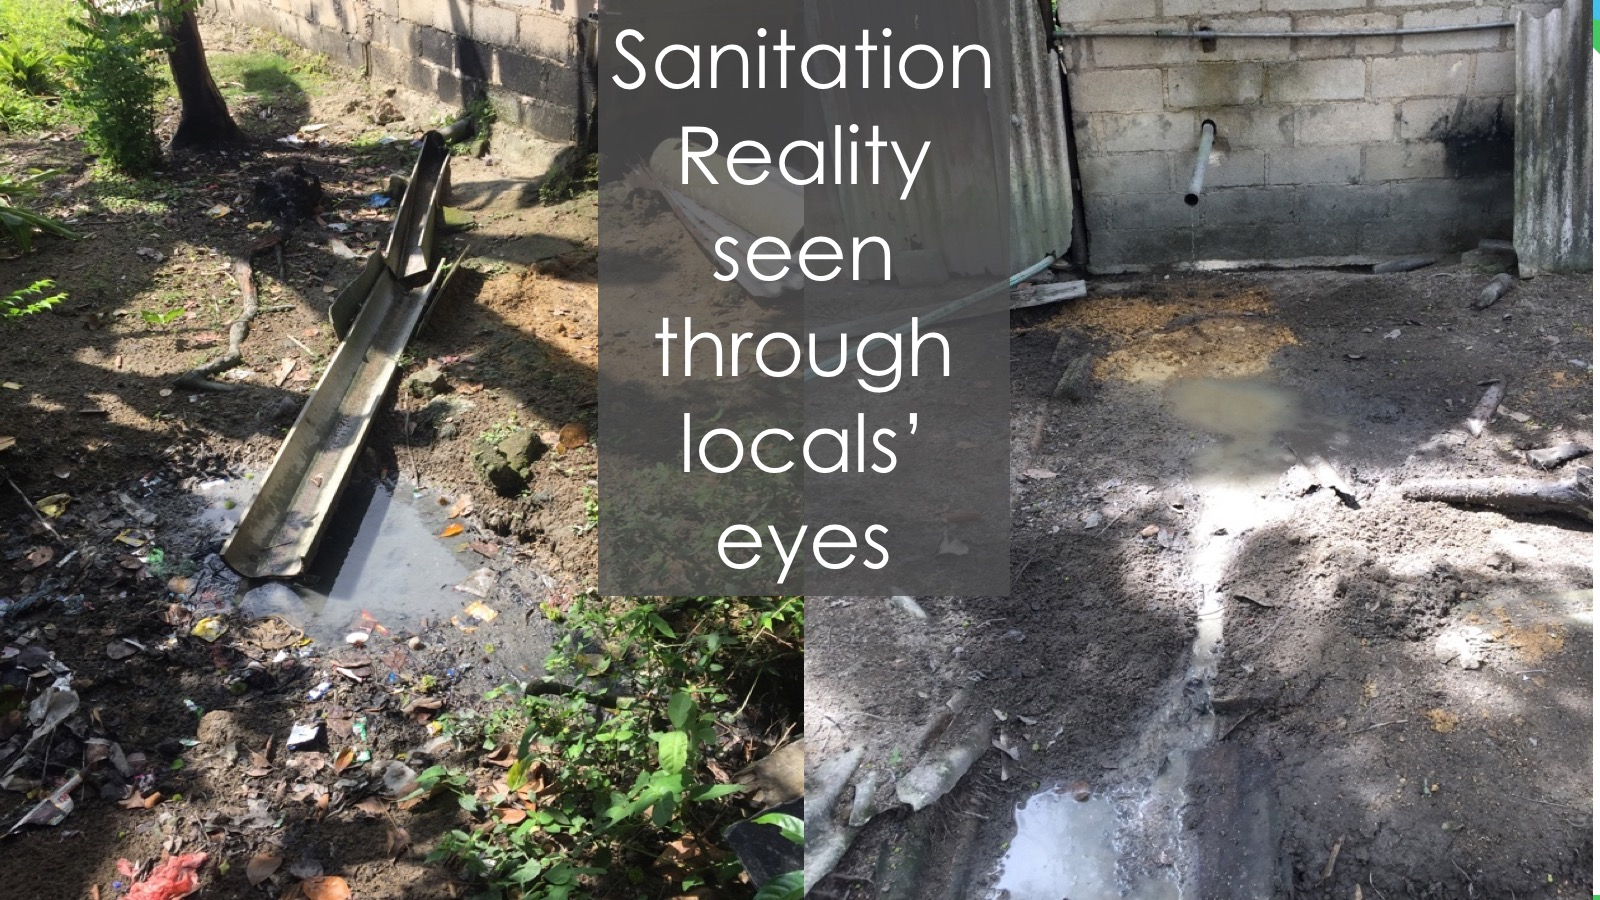 Sanitation reality seen through locals' eyes